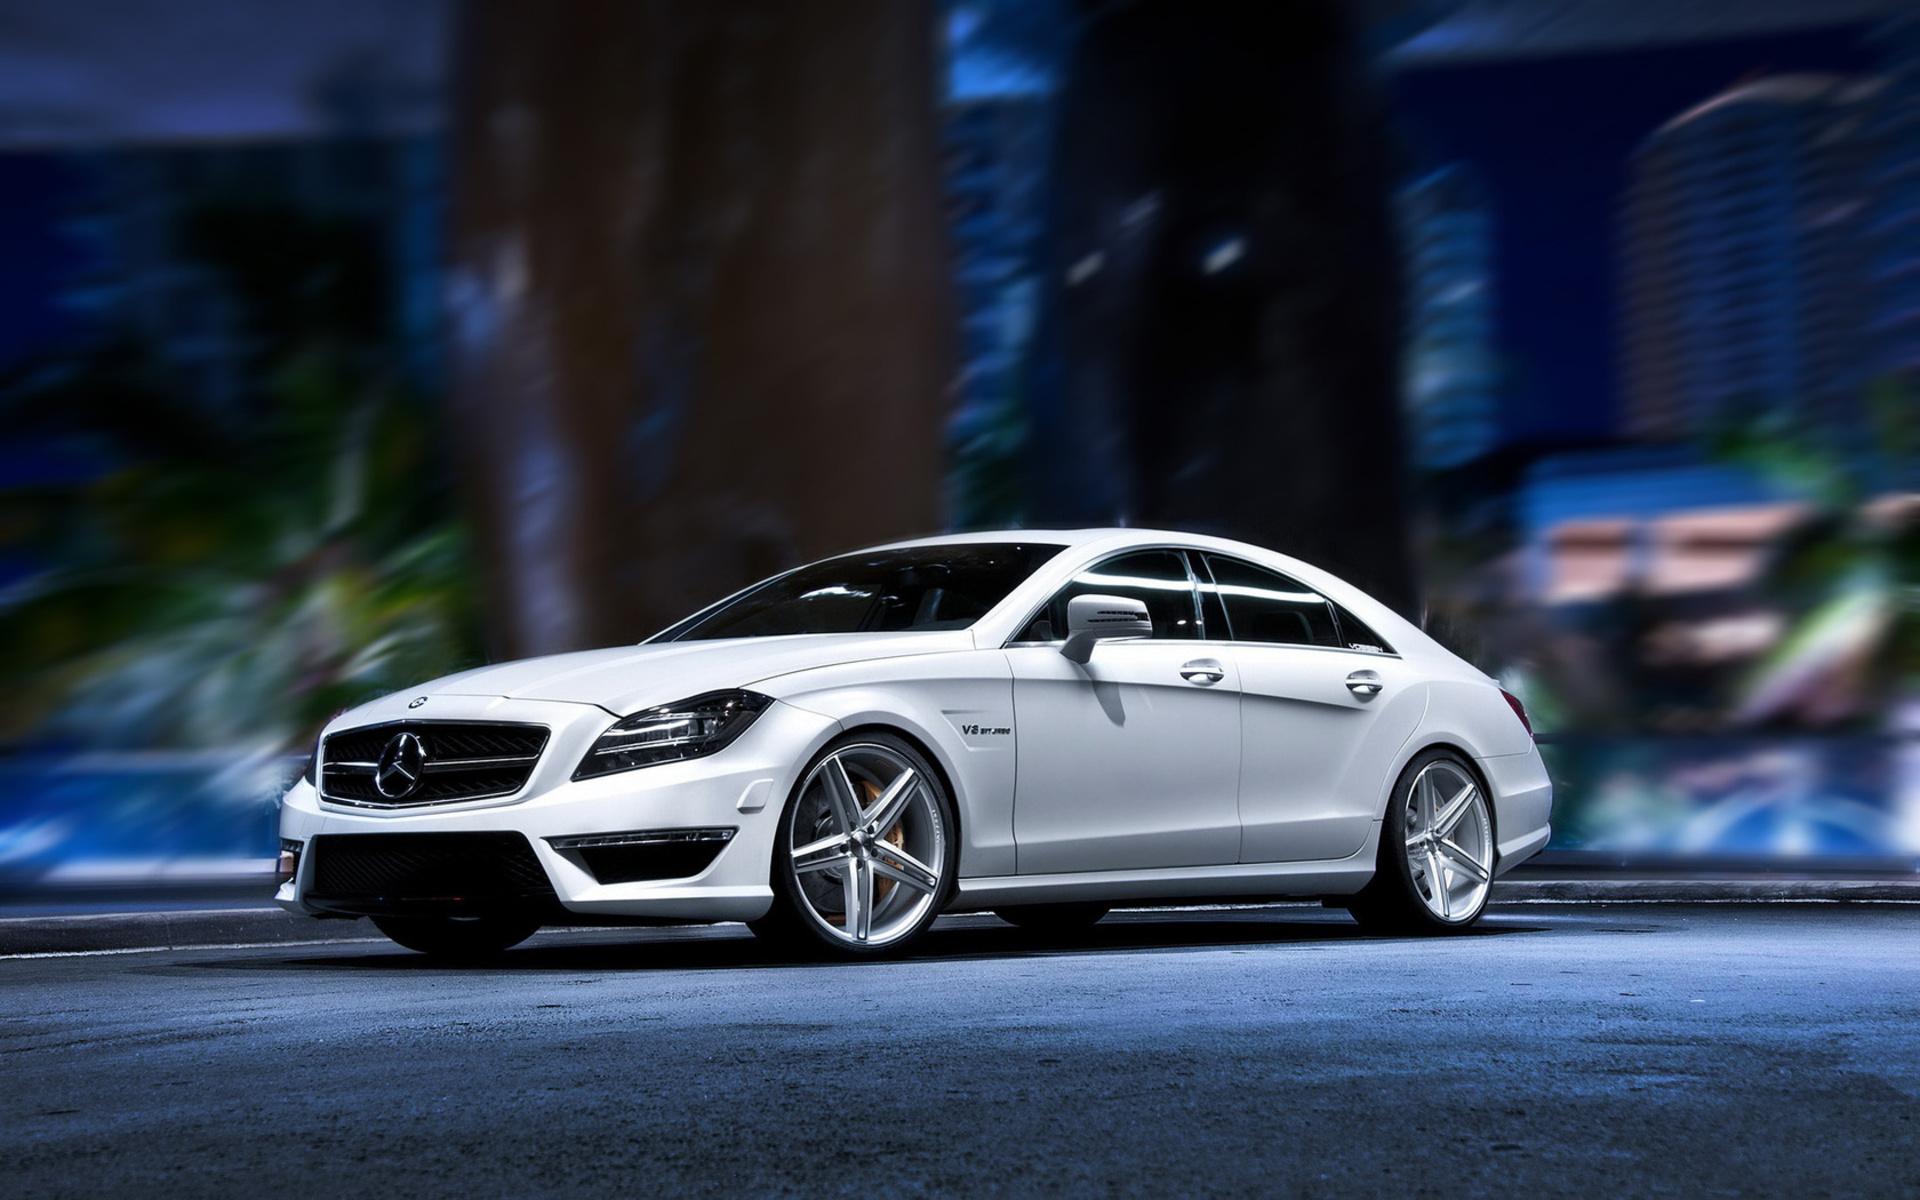 Mercedes Full HD Wallpaper and Hintergrund 1920x1200 1920x1200